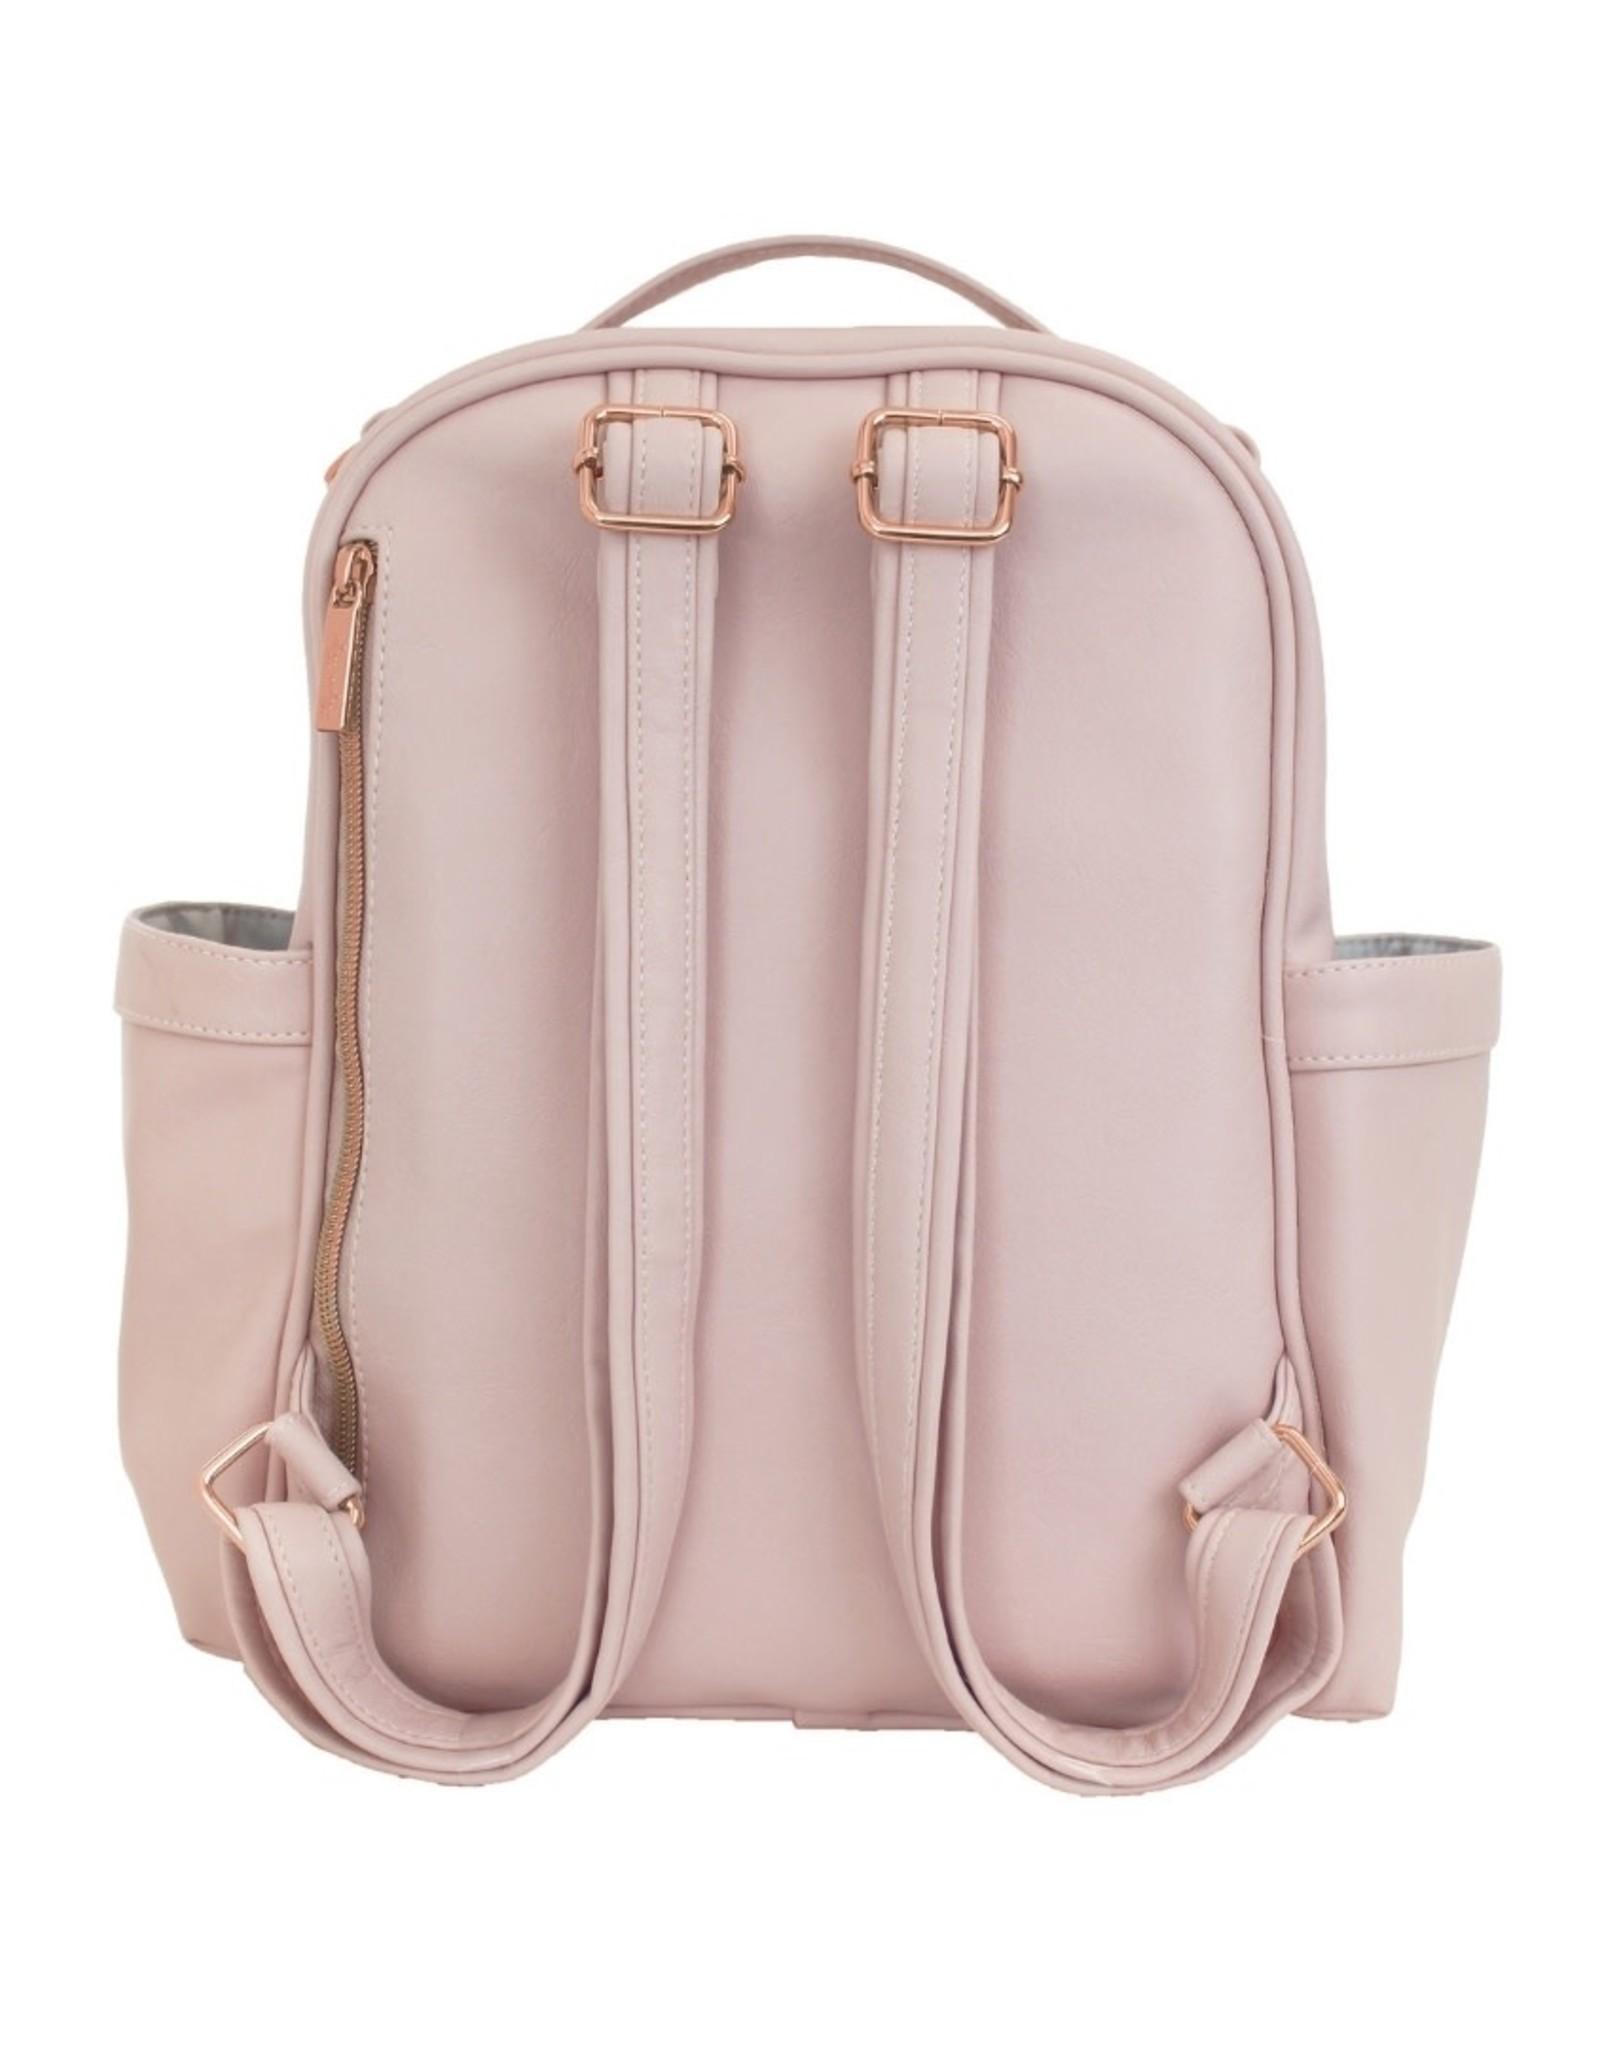 Itzy Ritzy Blush Itzy Mini™ Diaper Bag Backpack